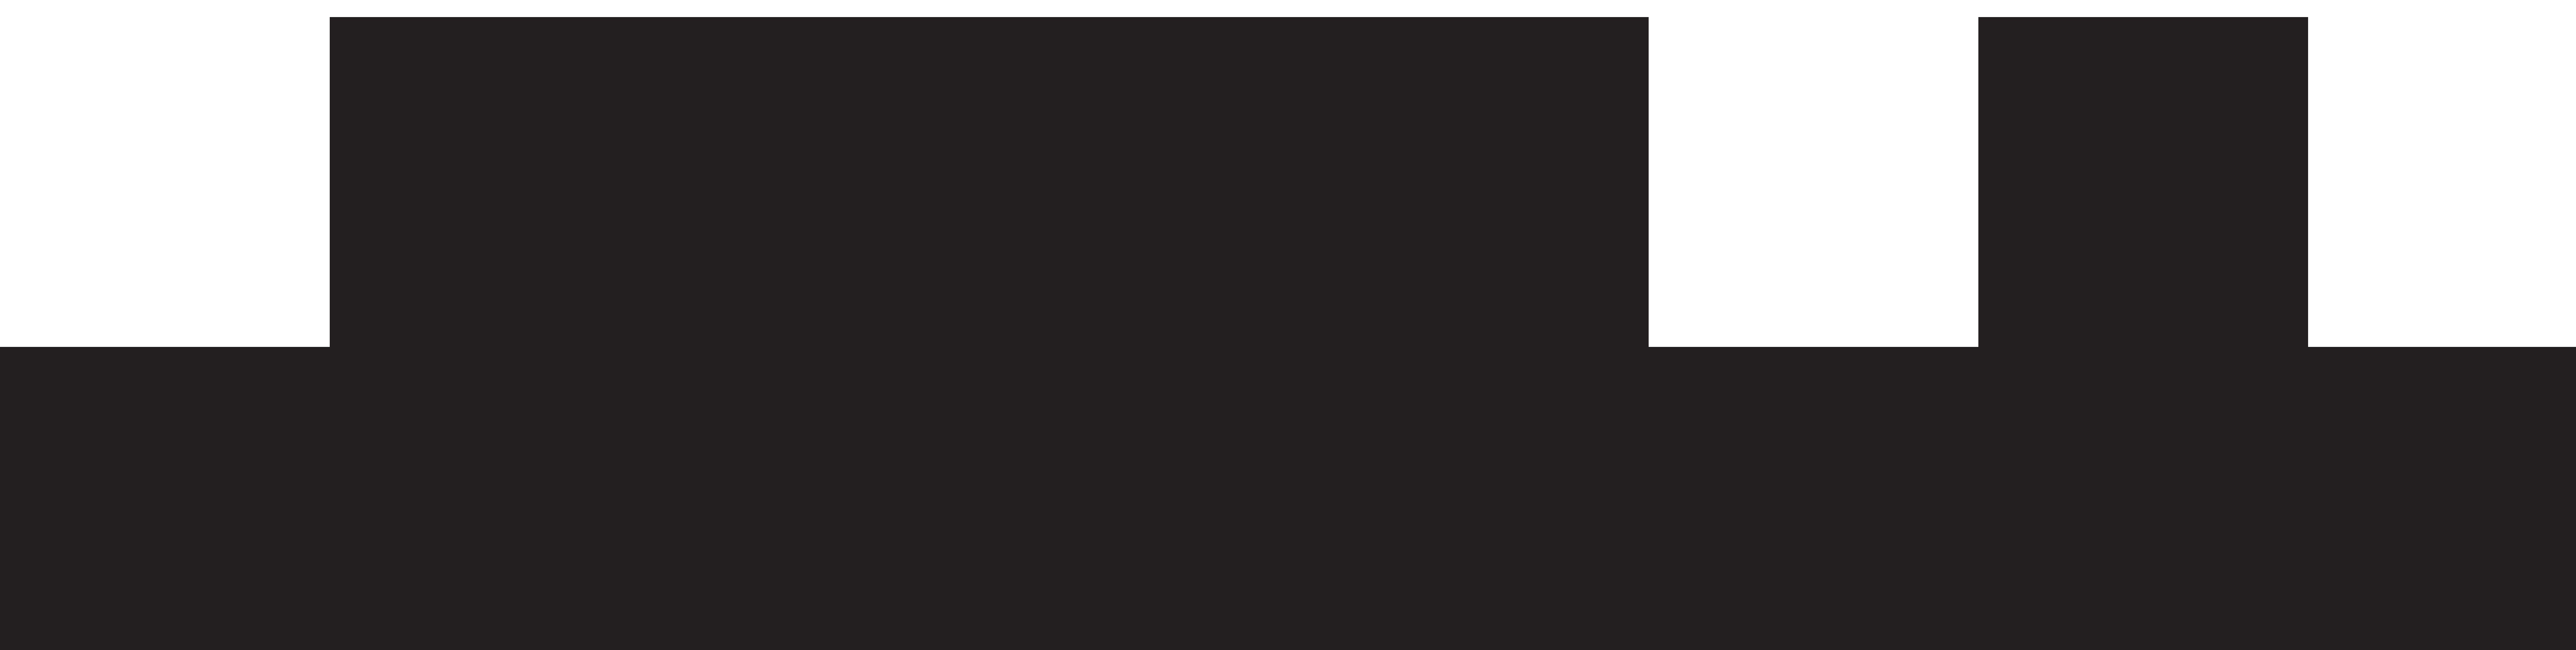 8000x2018 New York City Silhouette Skyline